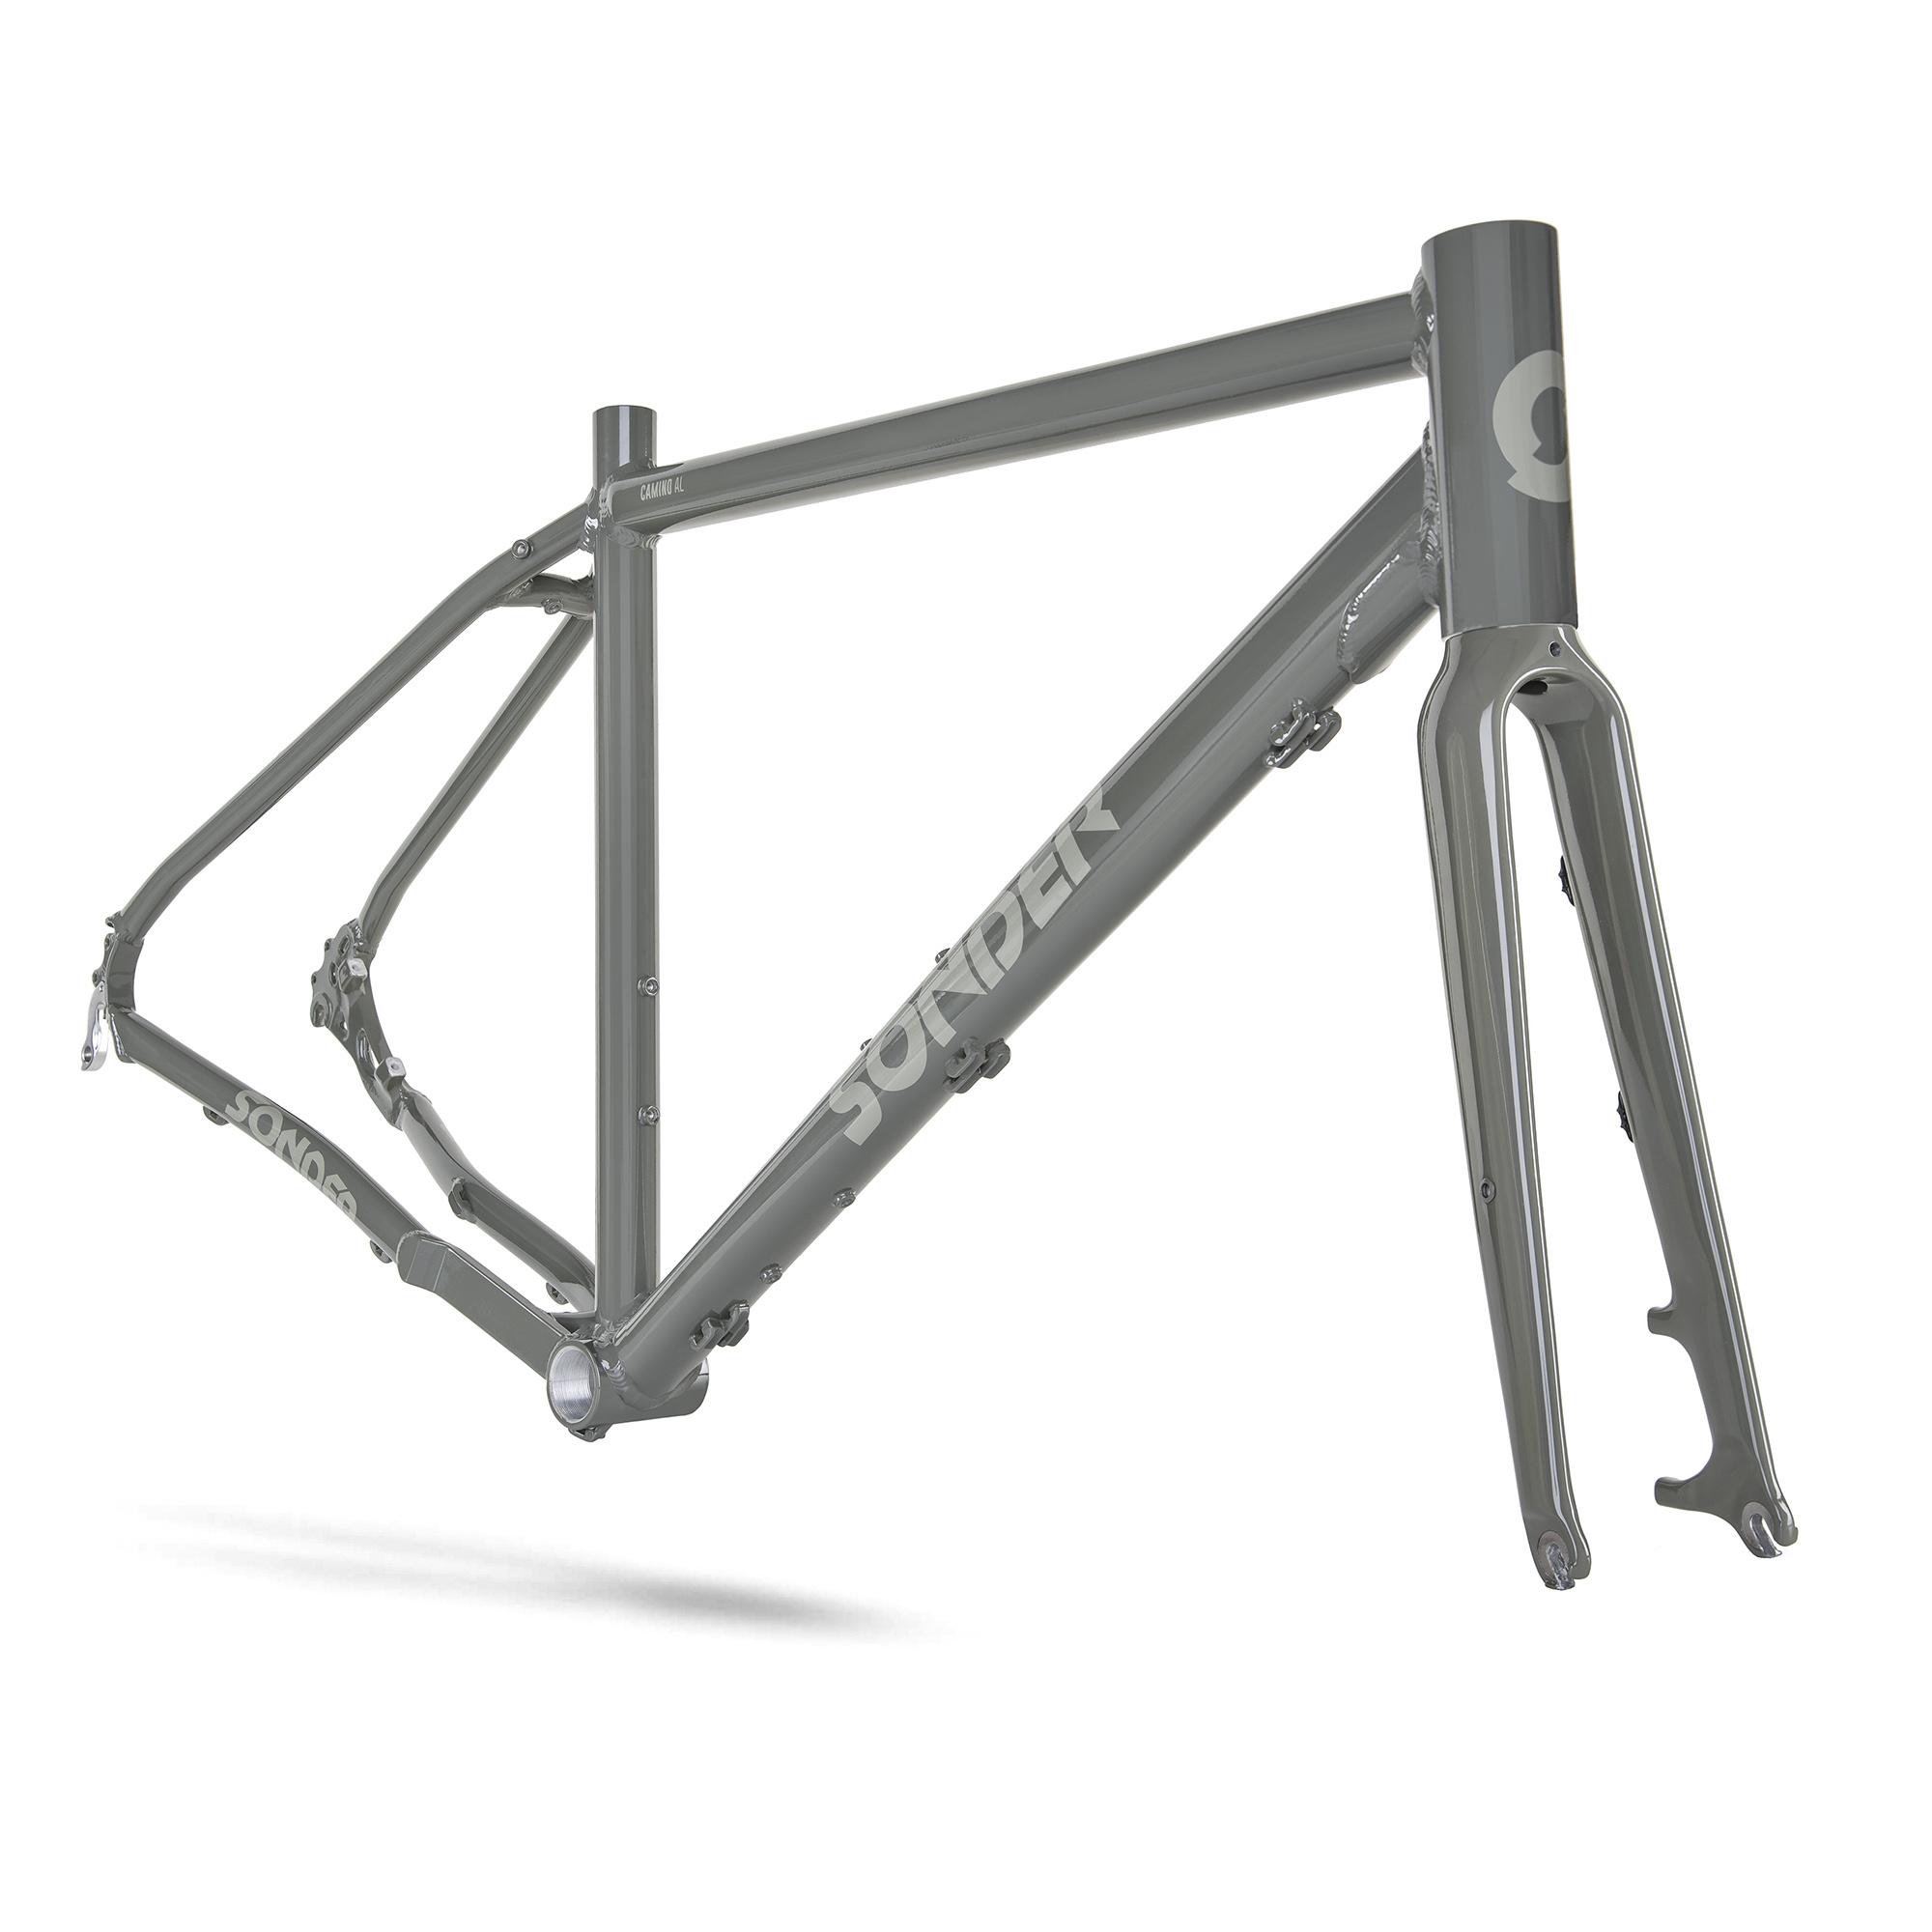 Cadre vélo Gravel Sonder Camino Al - coloris Chilli (taille XL) - Alpkit.com